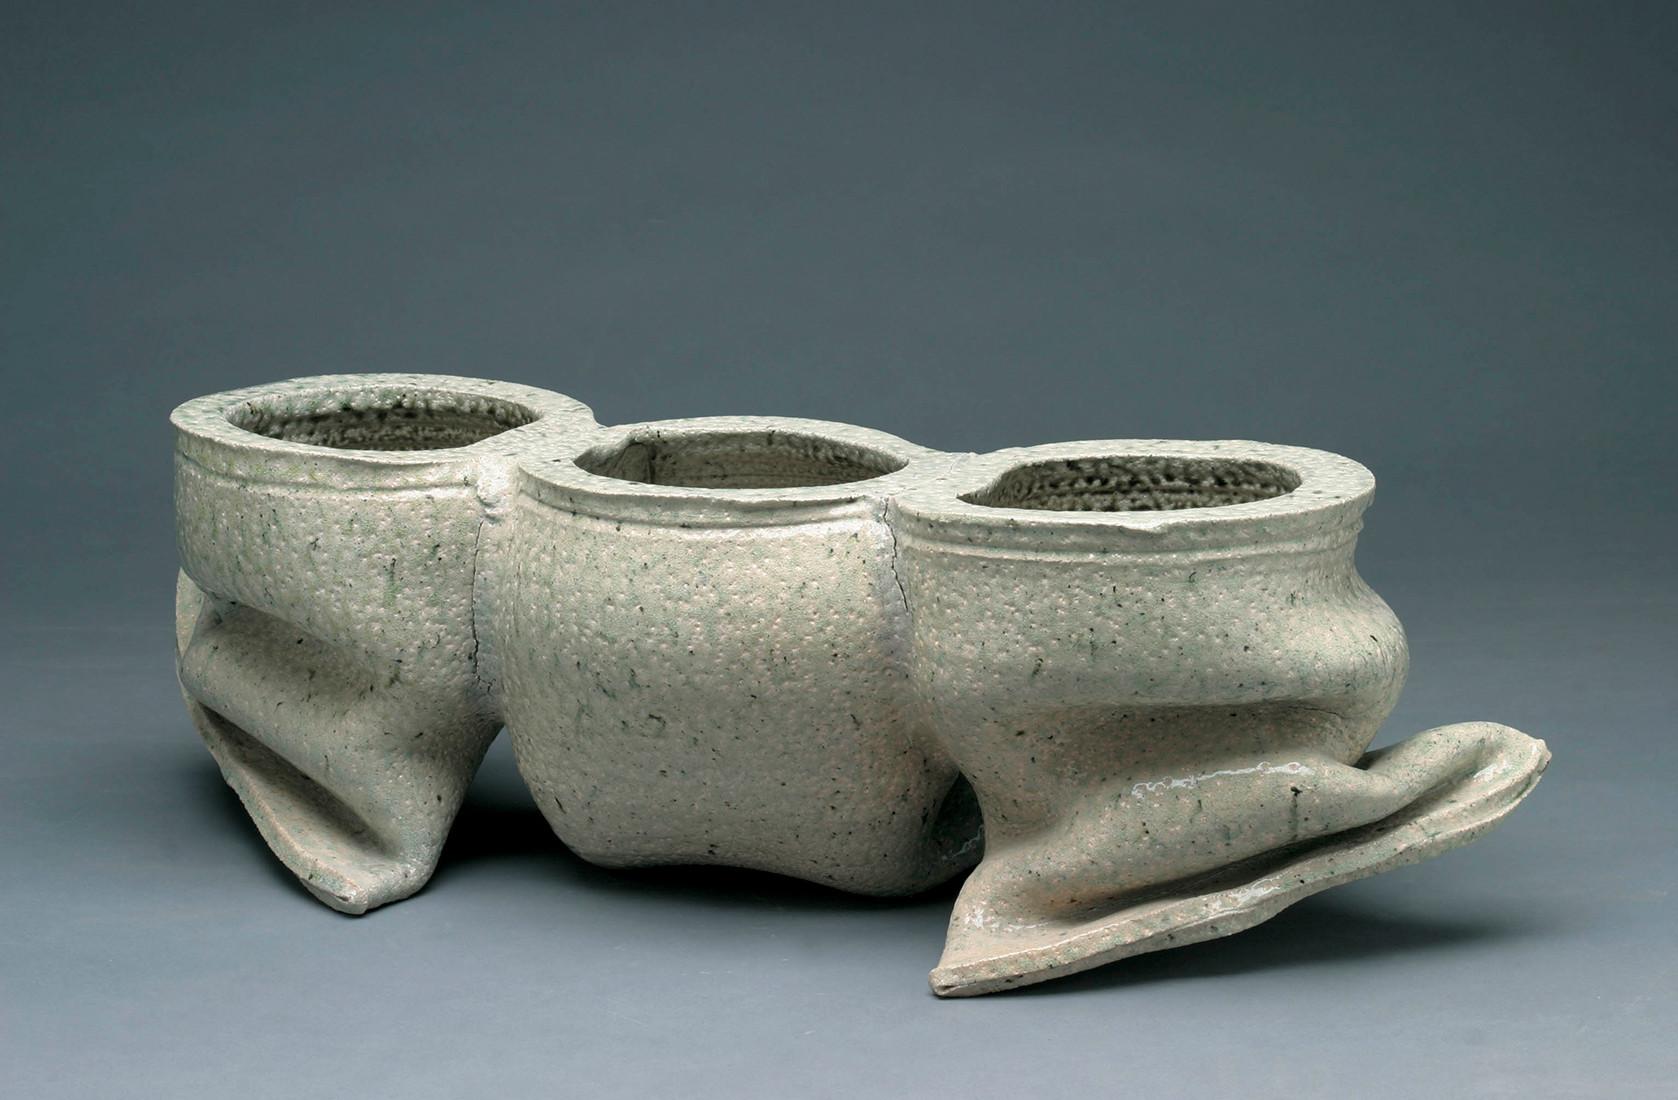 susan paley vases of david kordansky gallery for folded tri part vase 1975 salt glazed stoneware 8 x 25 x 8 inches 20 3 x 63 5 x 20 3 cm